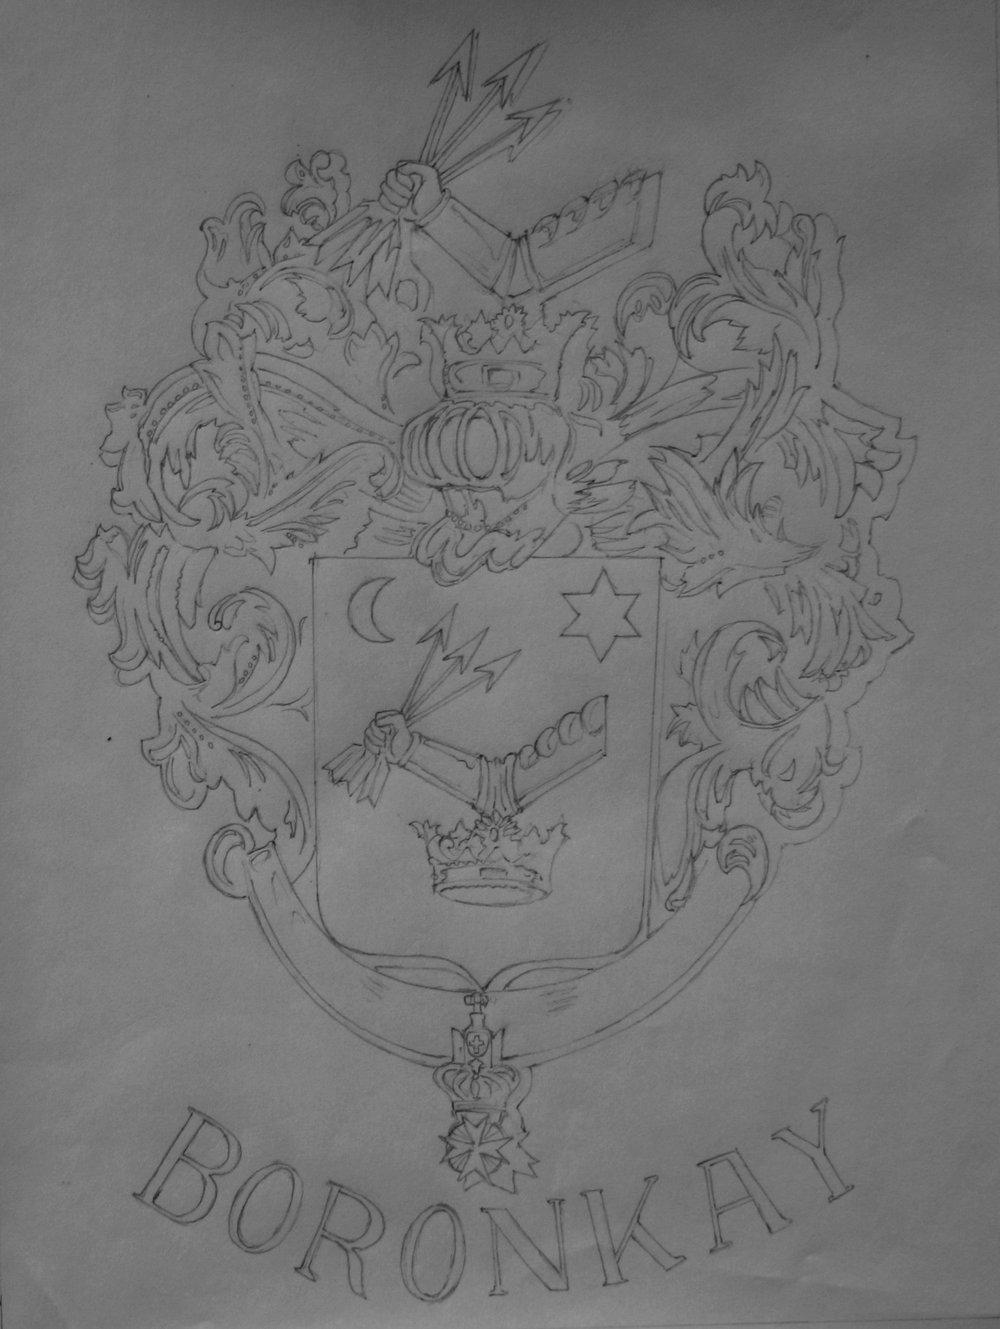 David crest drawing.jpg